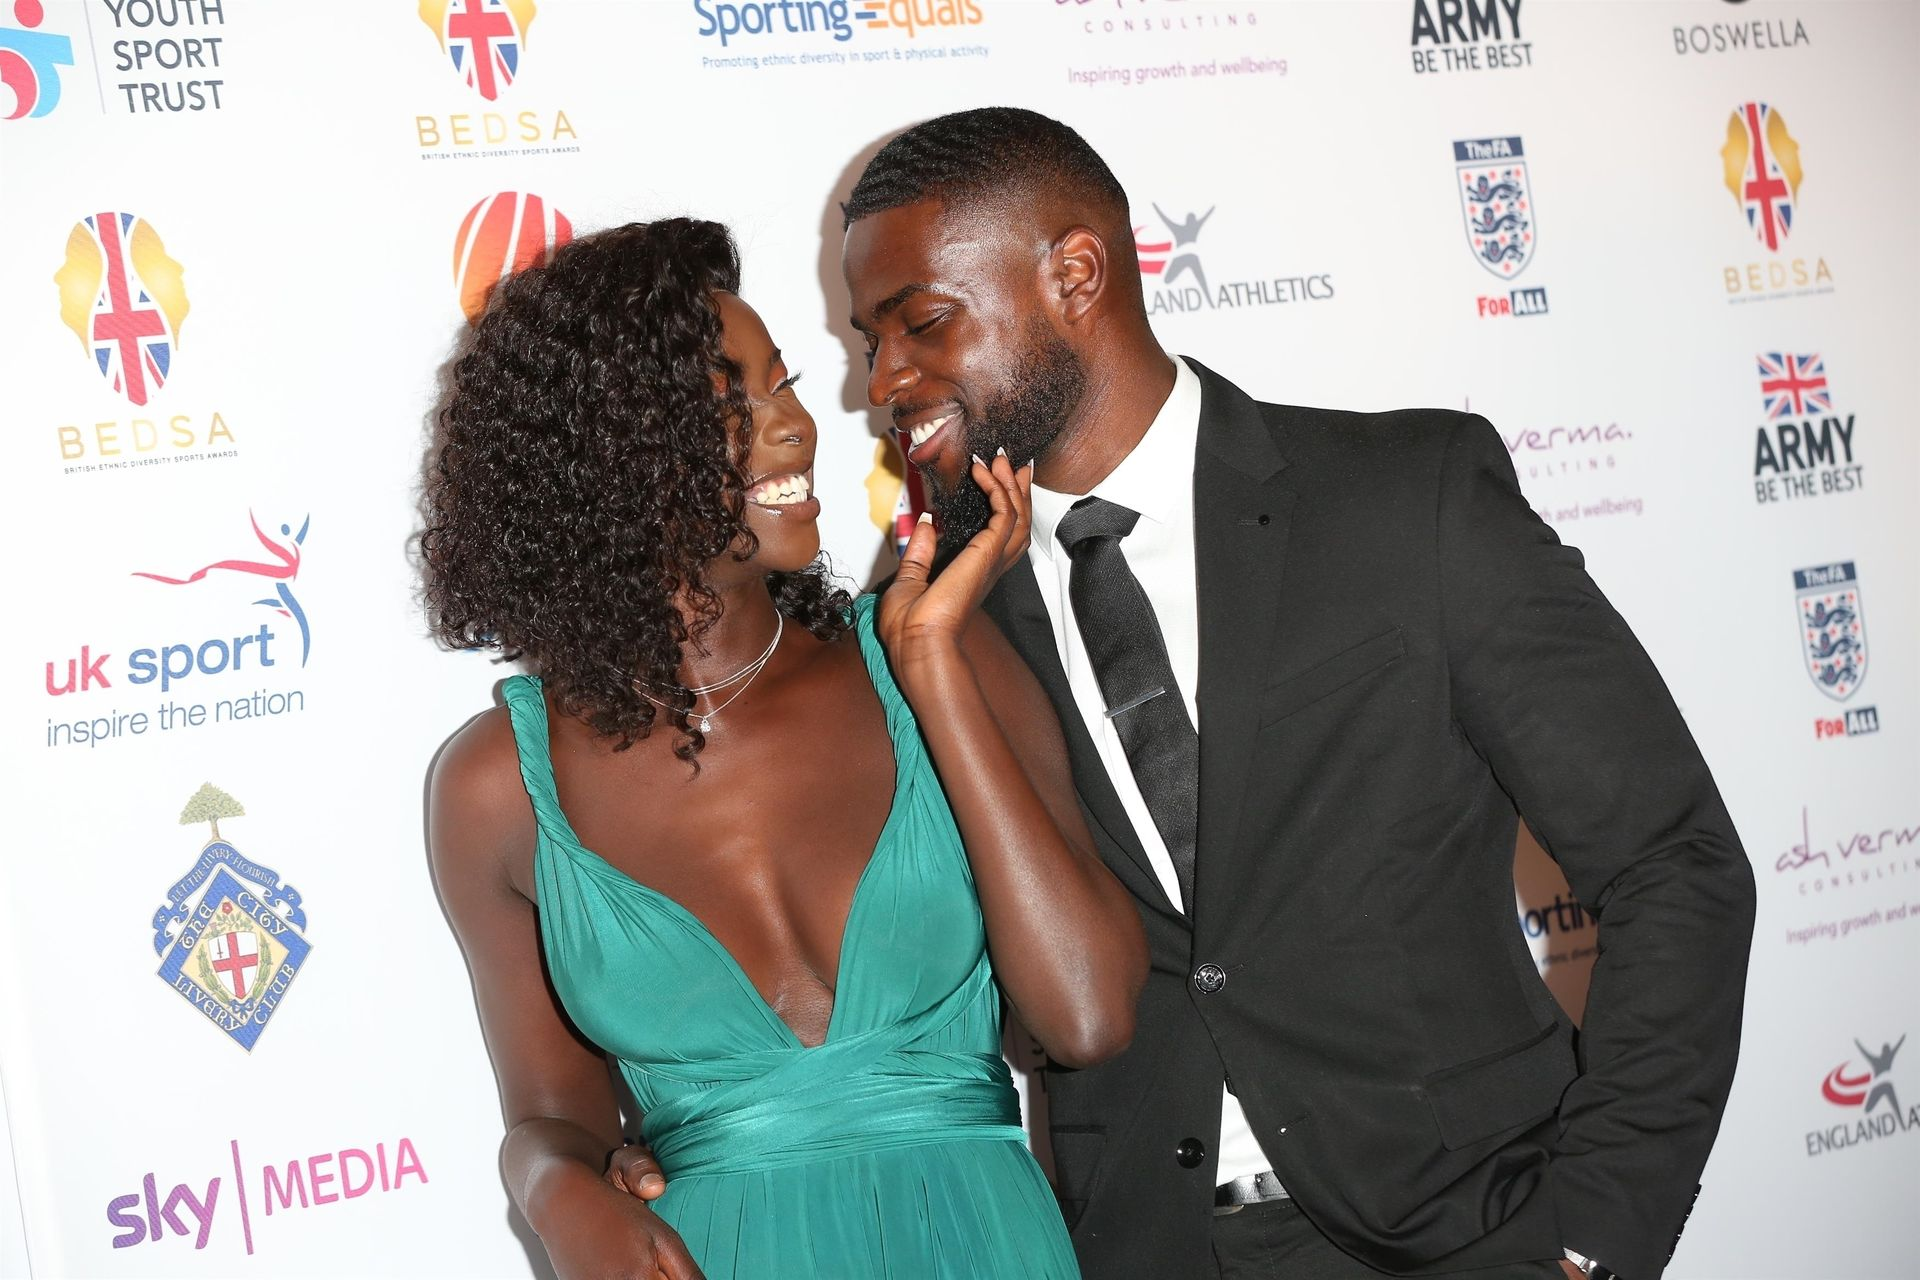 Mike Boateng & Priscilla Anyabu Are Seen At British Ethnic Diversity Sports Awards 0073